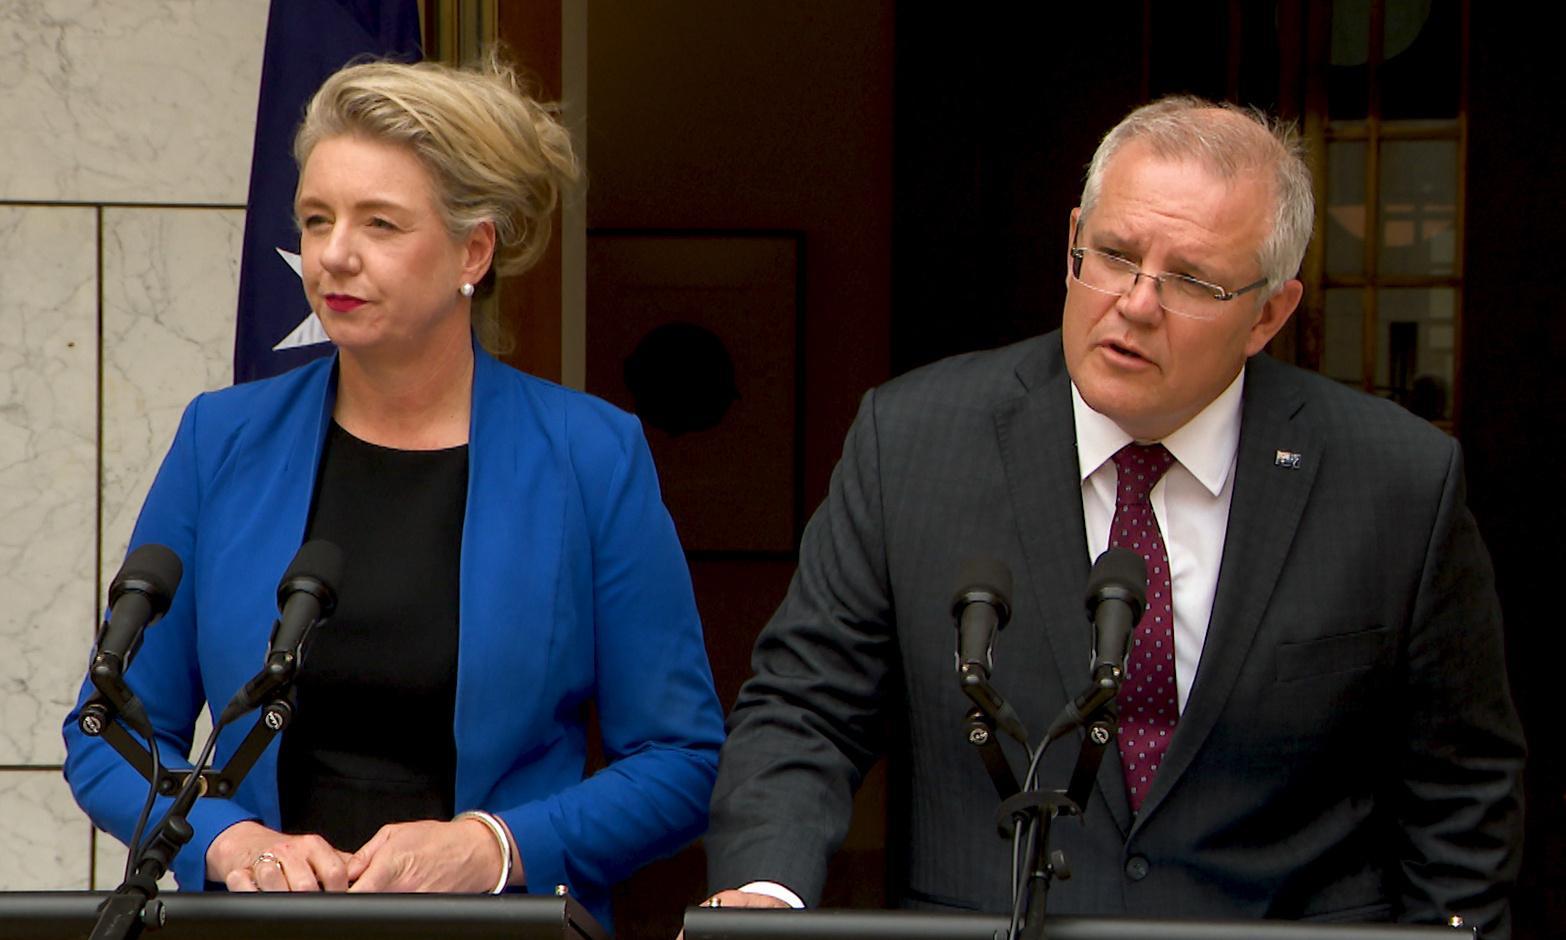 Bridget McKenzie gave Sport Australia final list of grant projects in caretaker period